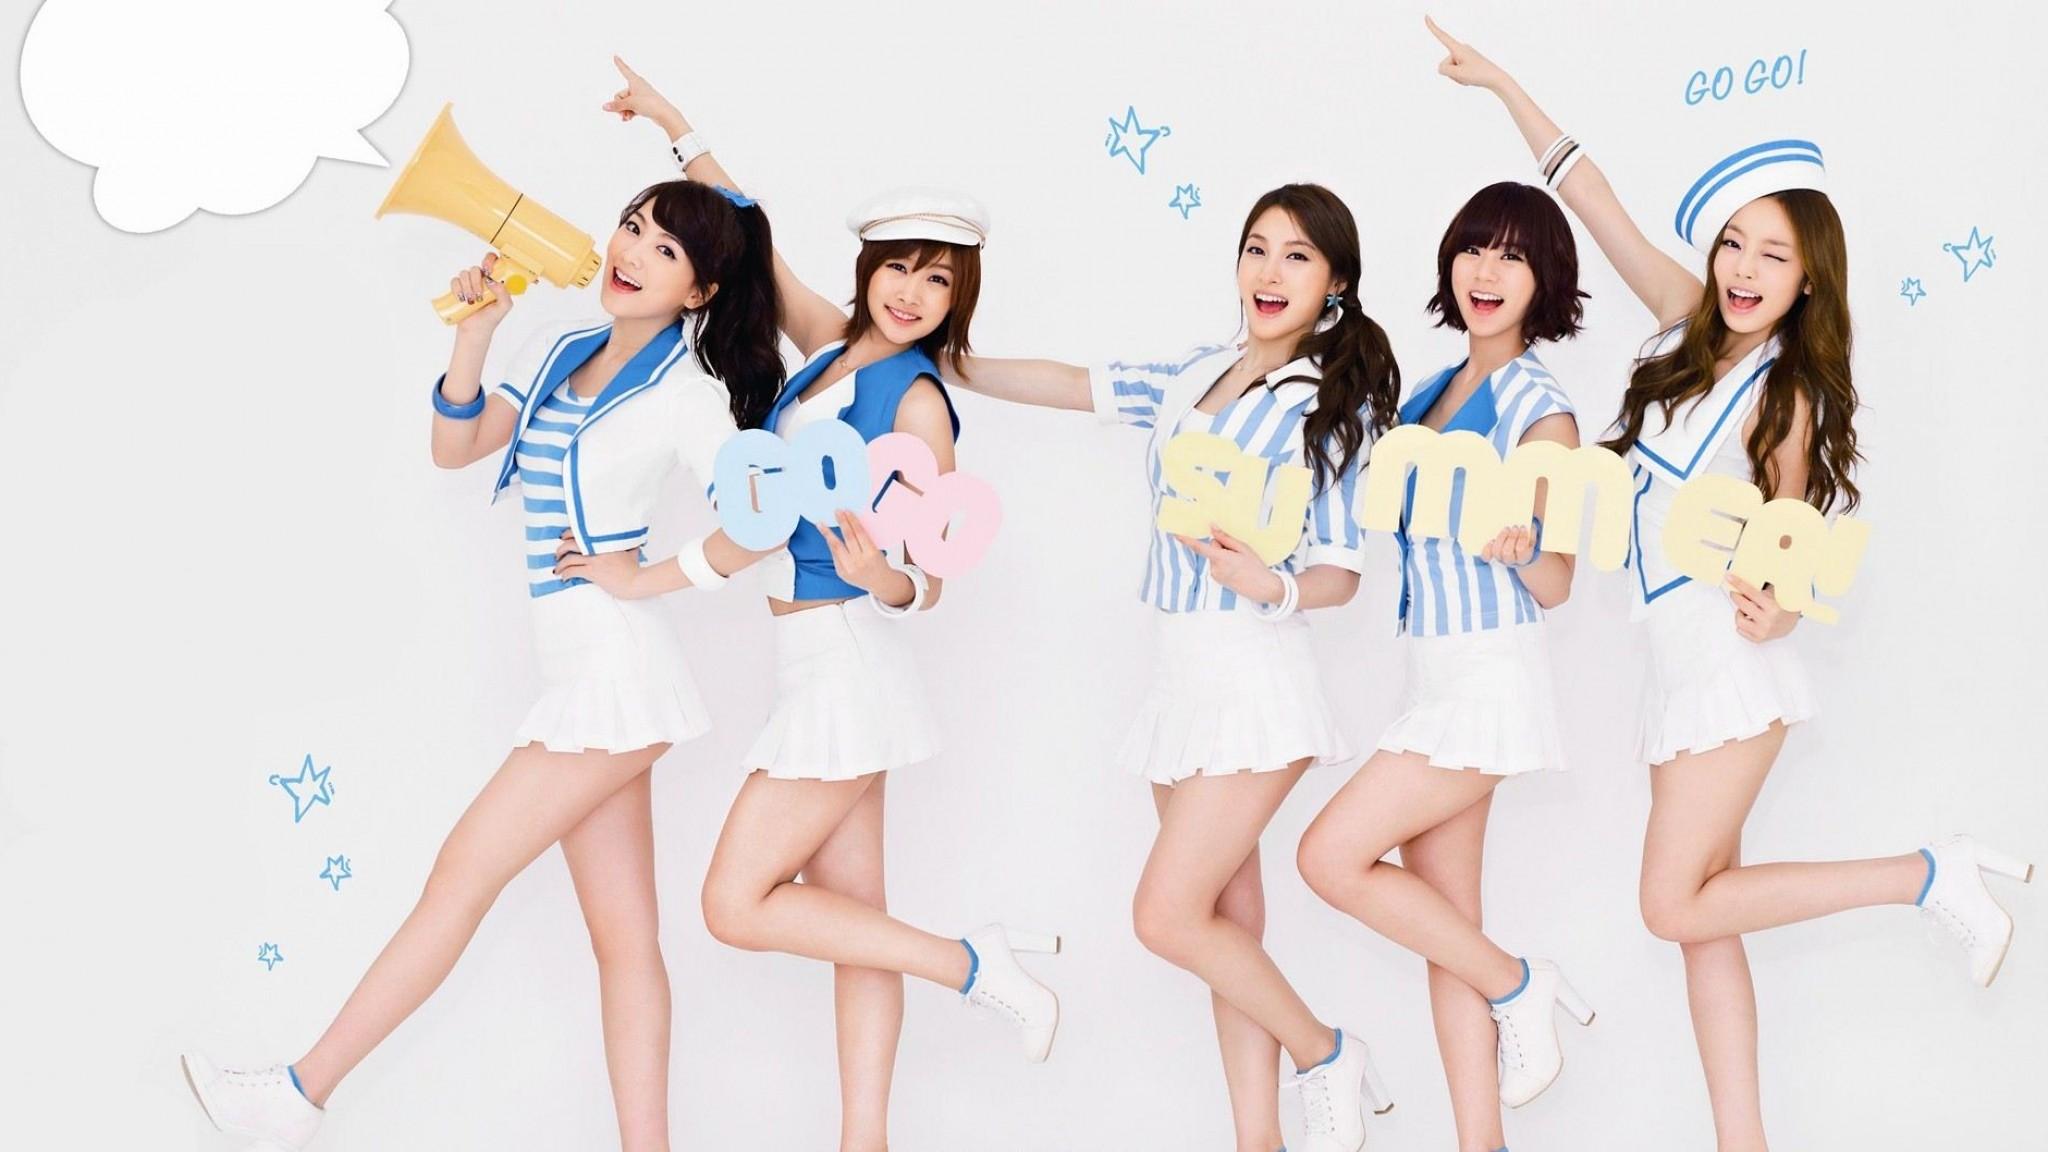 Women Music Korean Kpop South Korea Korean Girls   skipwall  HD Wallpaper